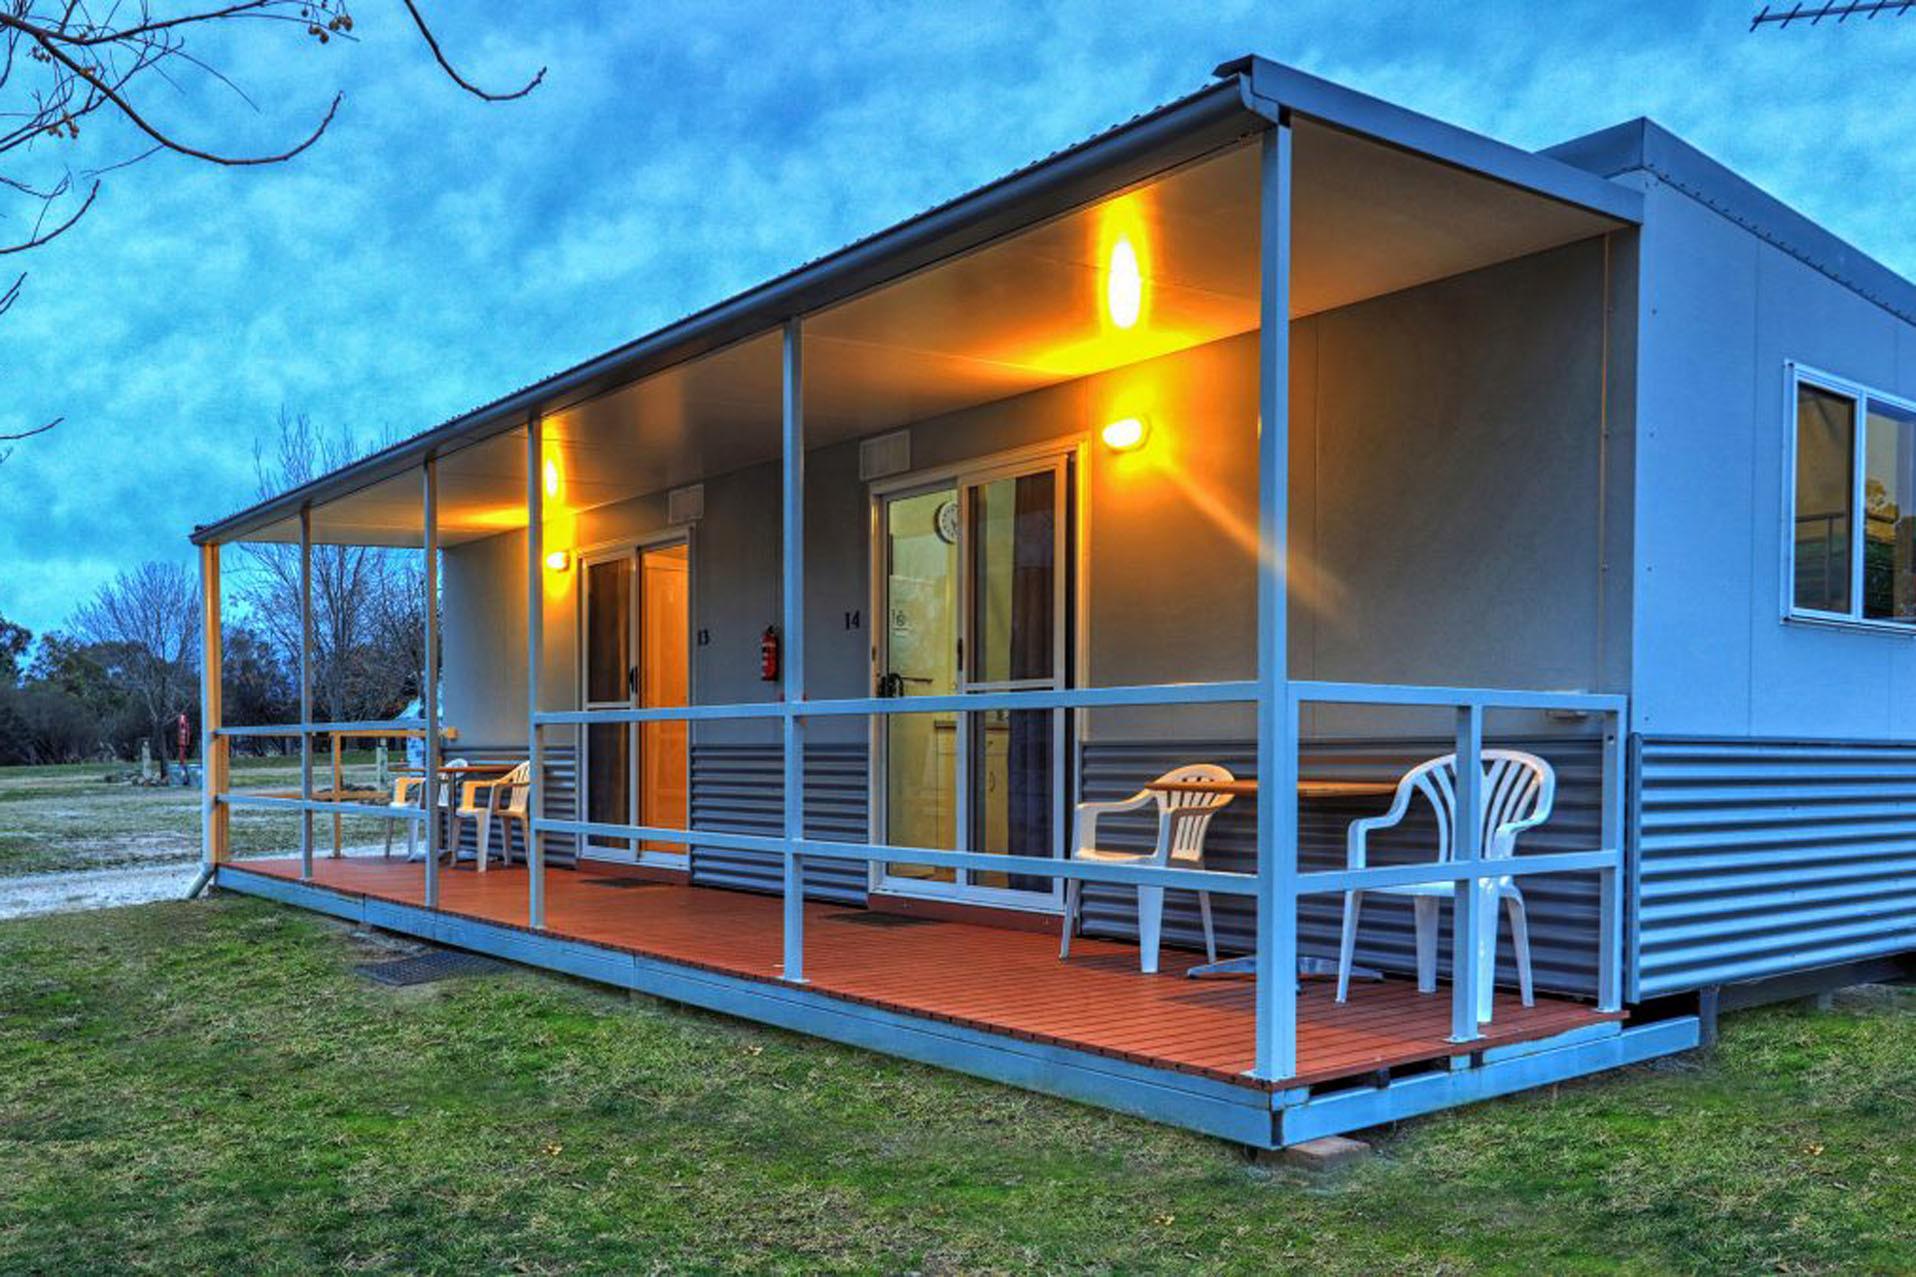 a - Country Style Caravan Park